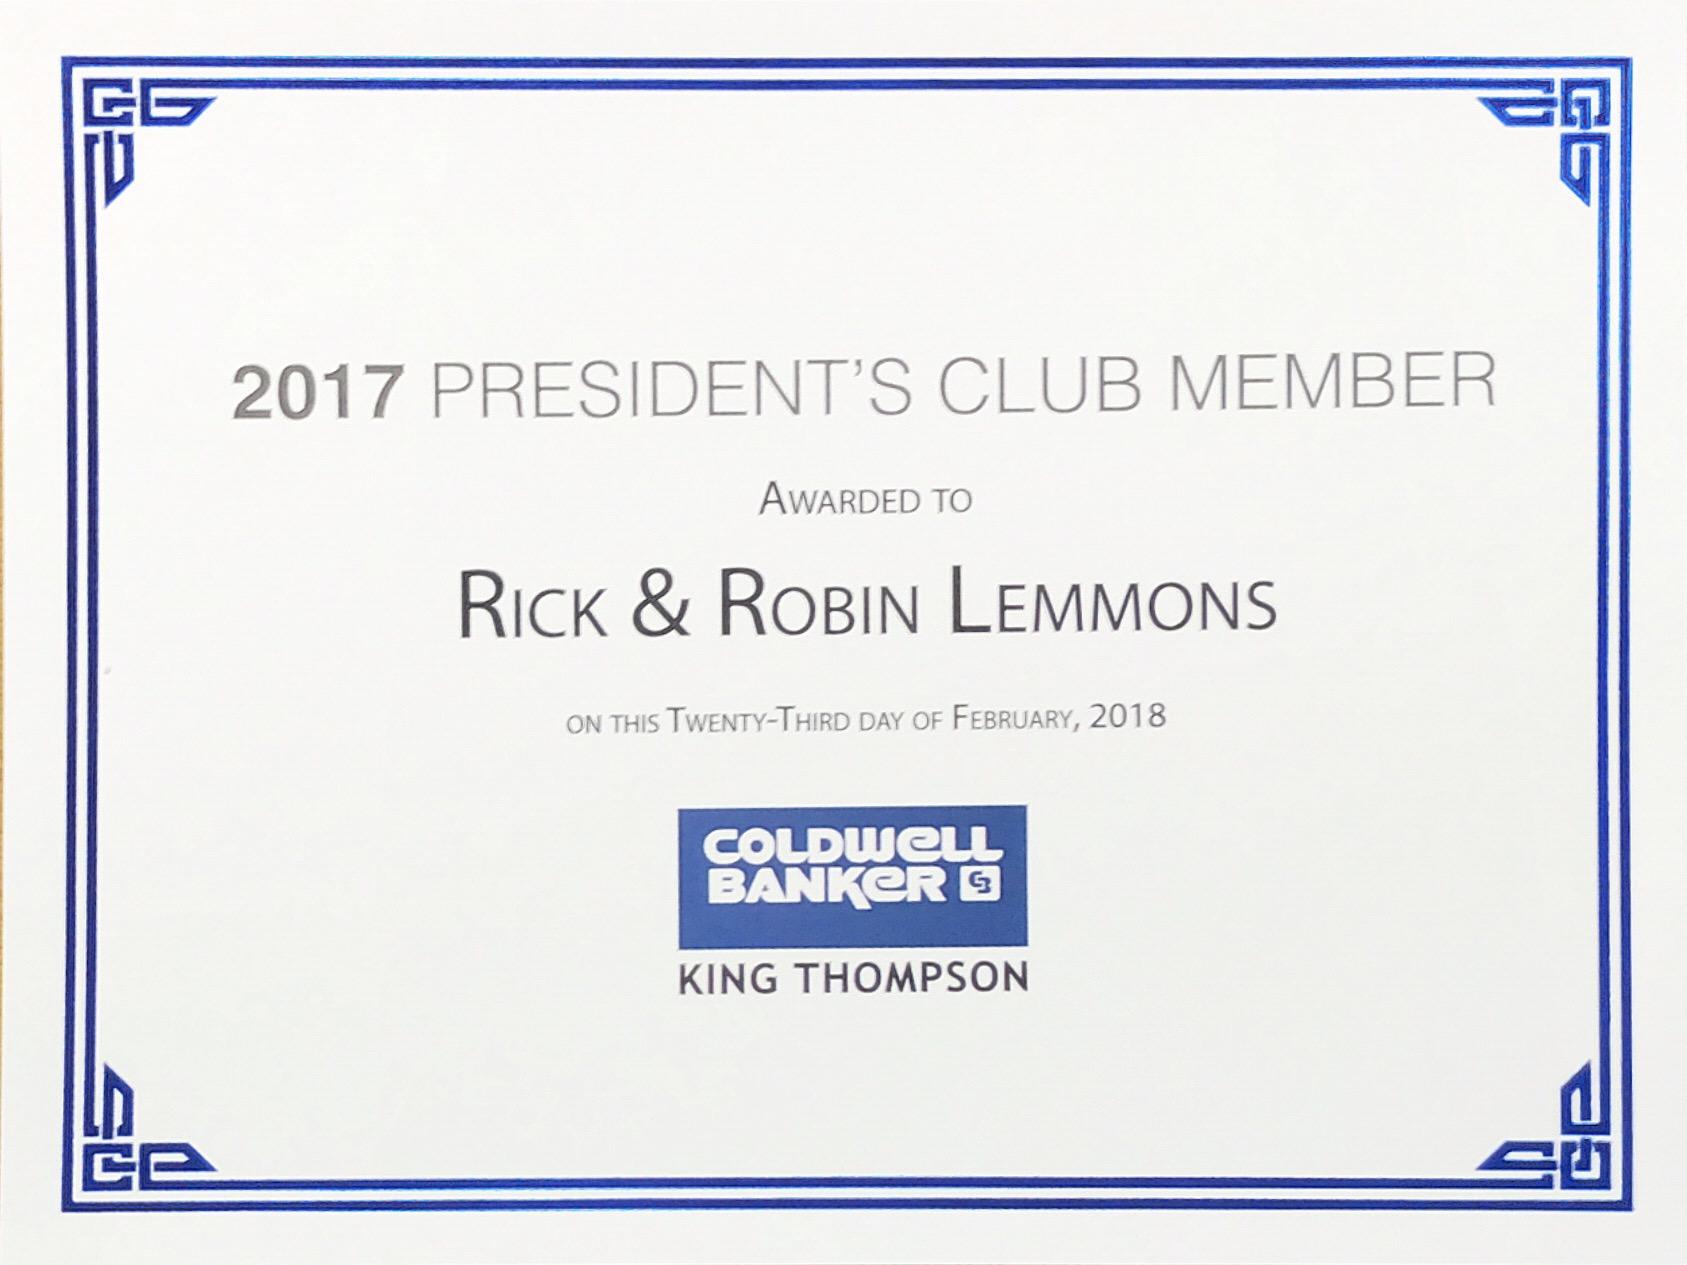 2017 President's Club